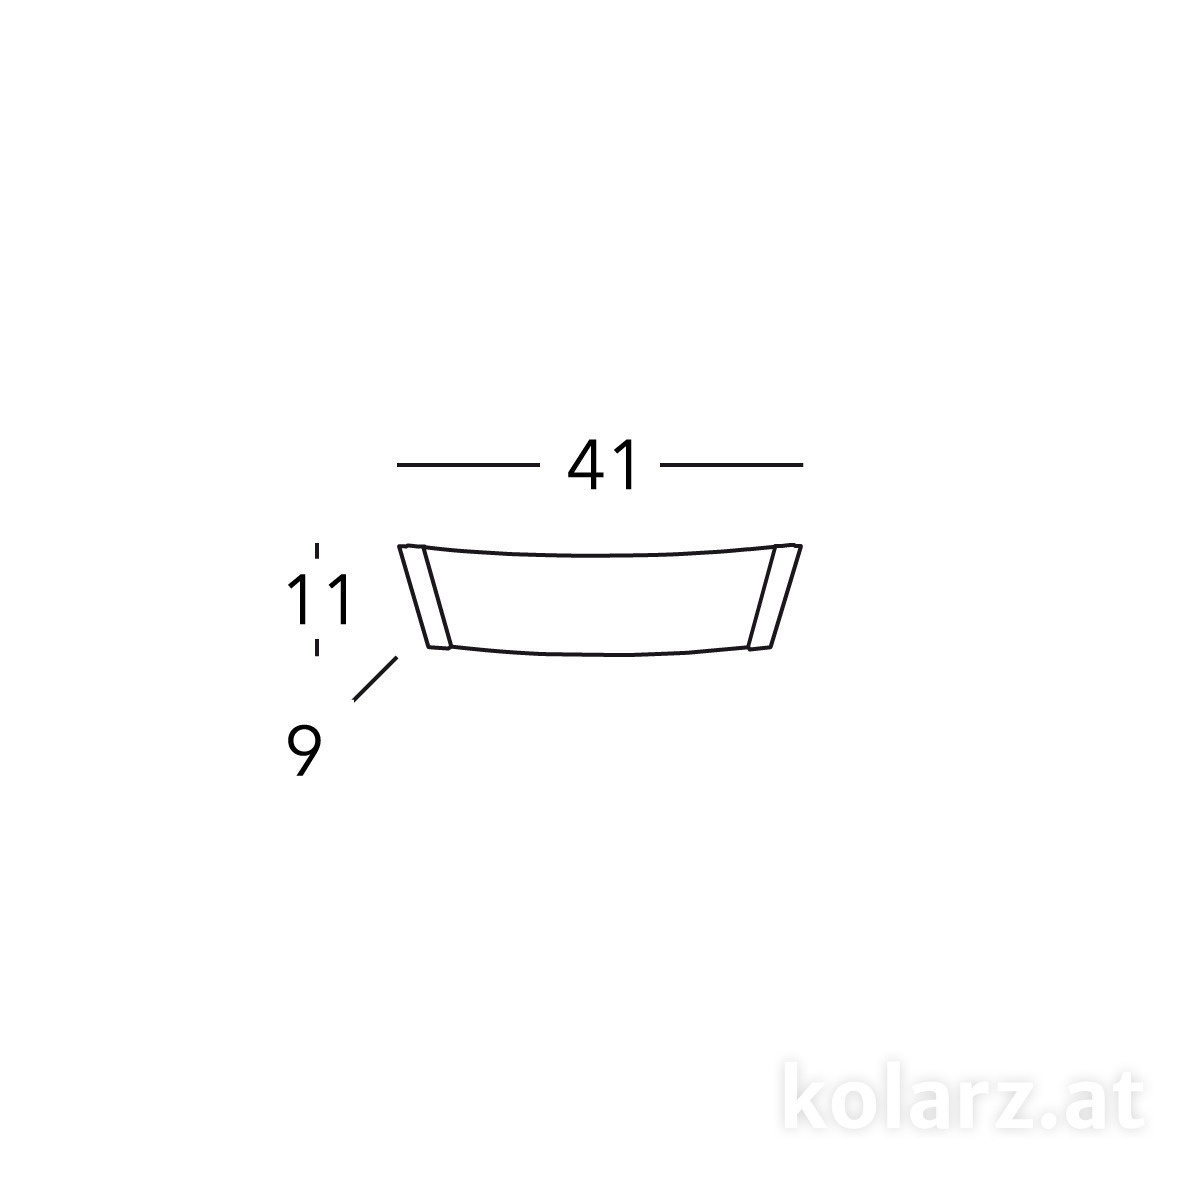 2295-62-5__ki50-s1.jpg